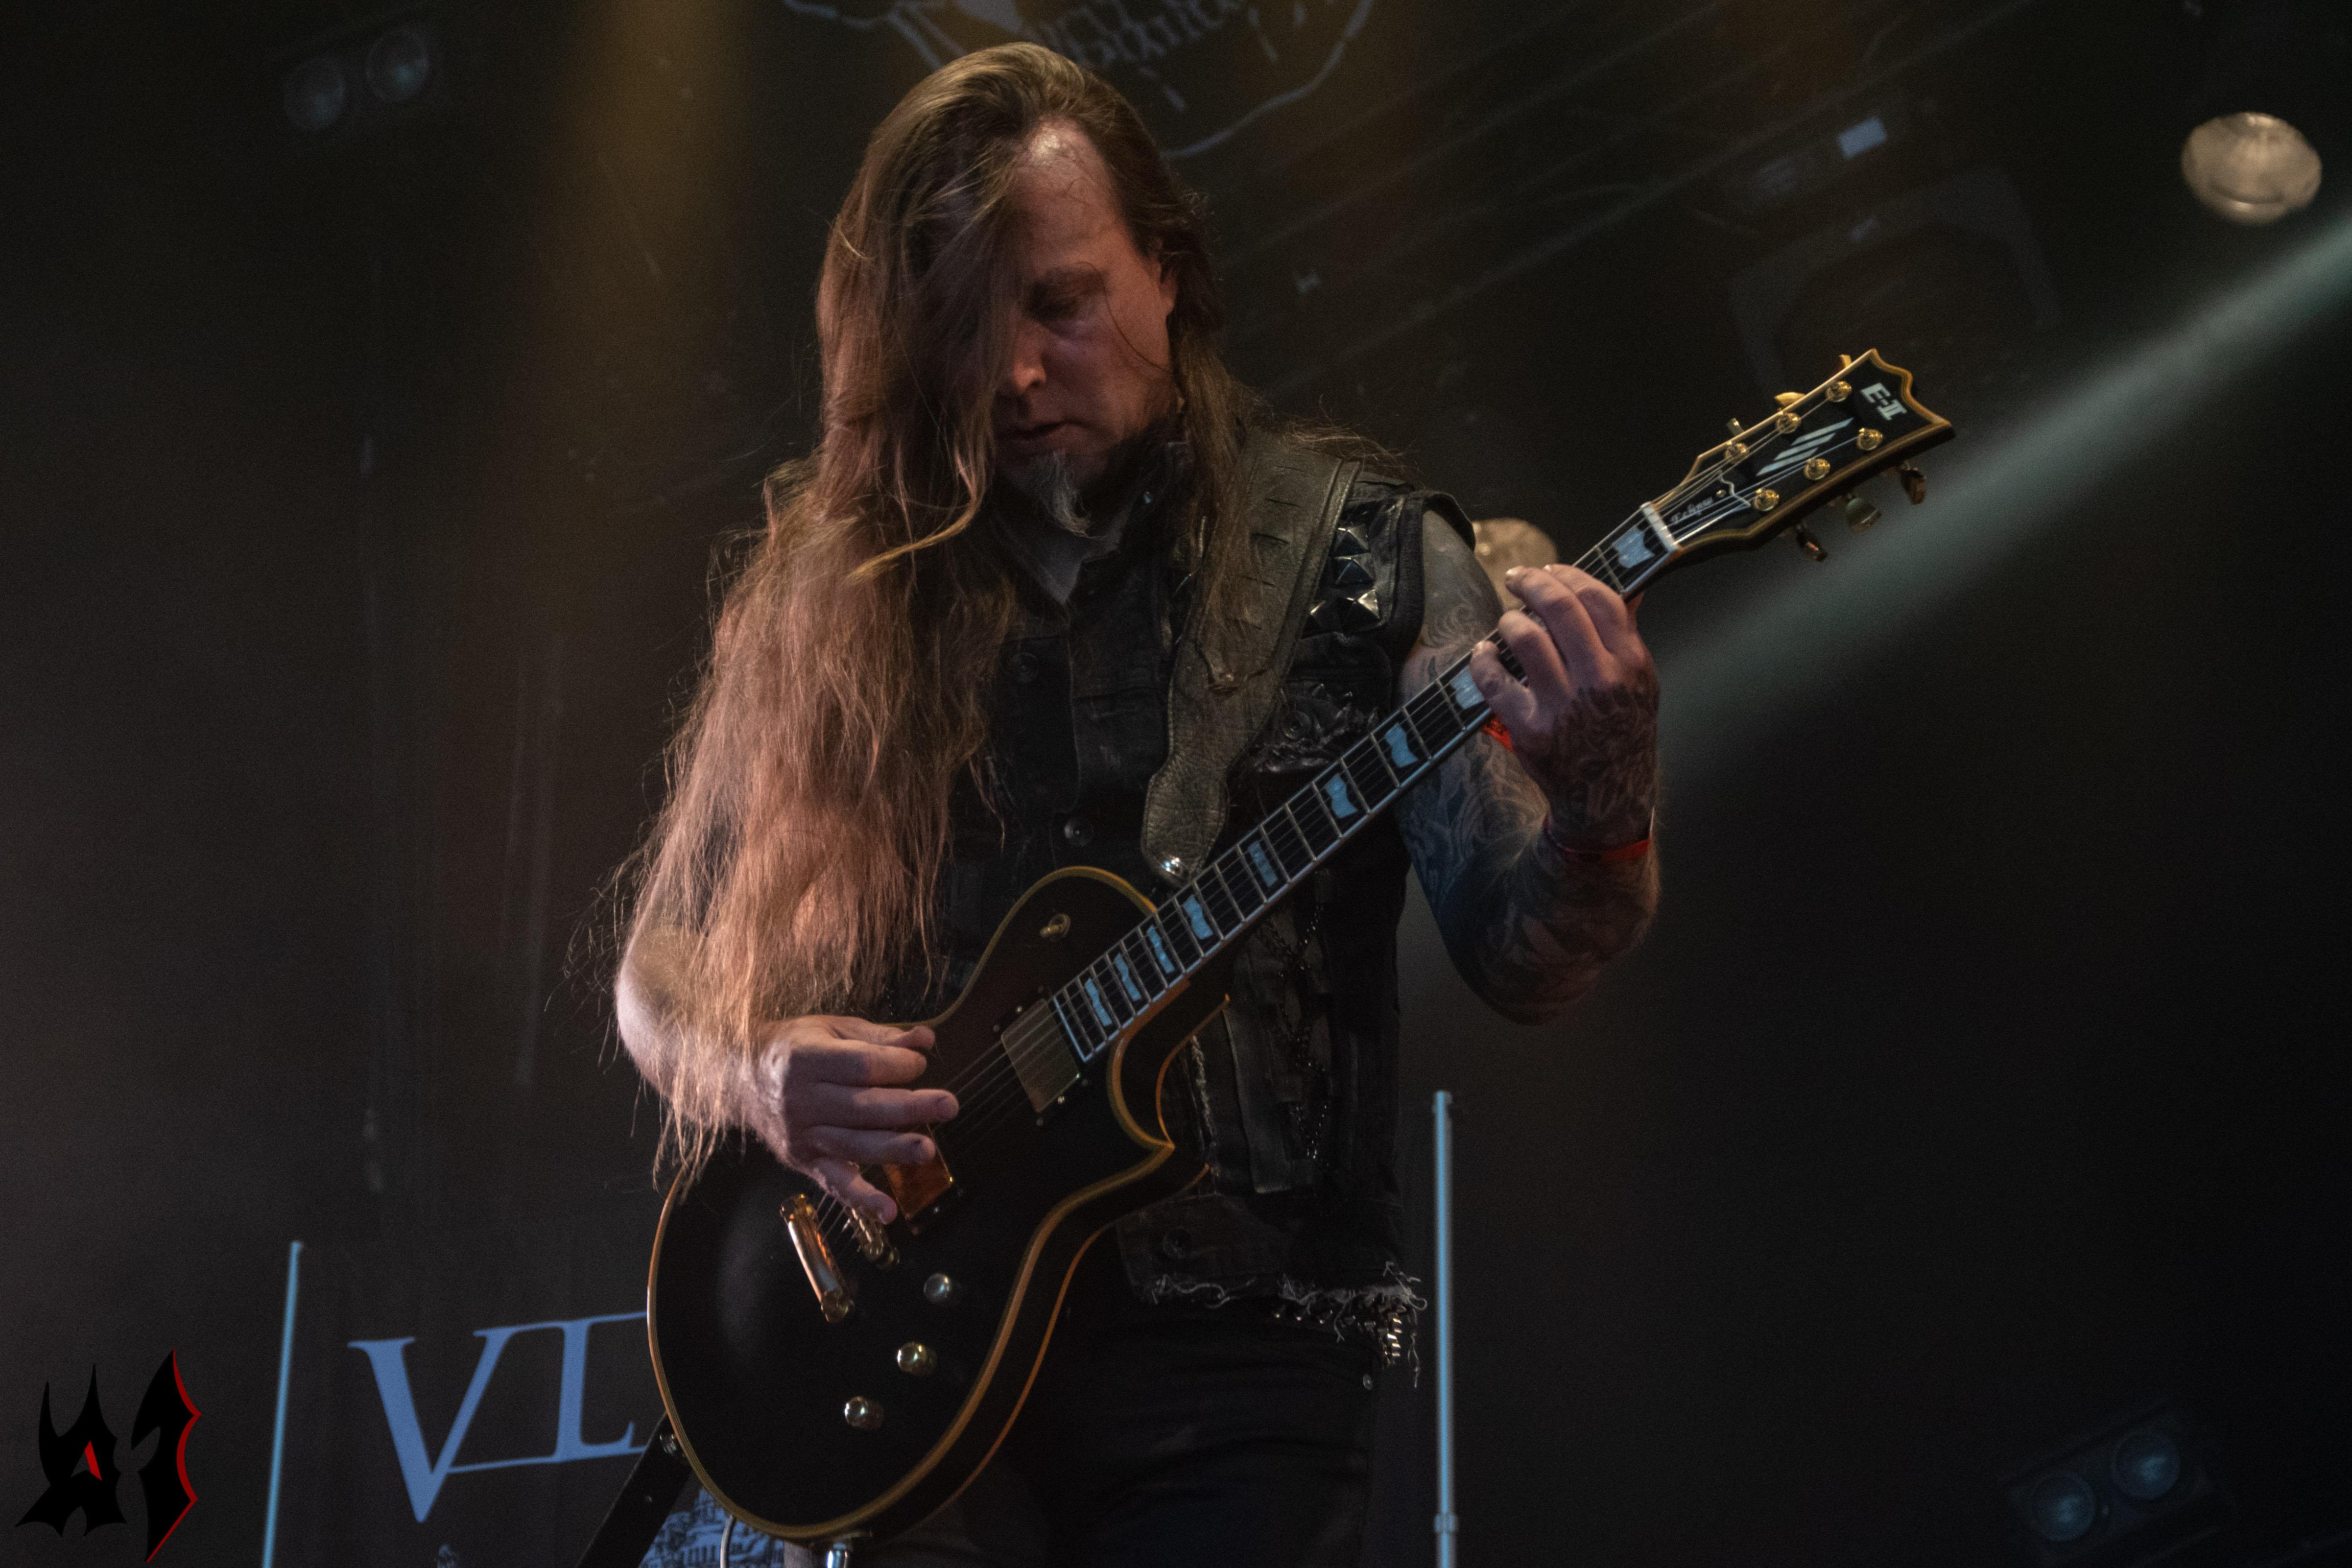 Hellfest - Vltimas - 10